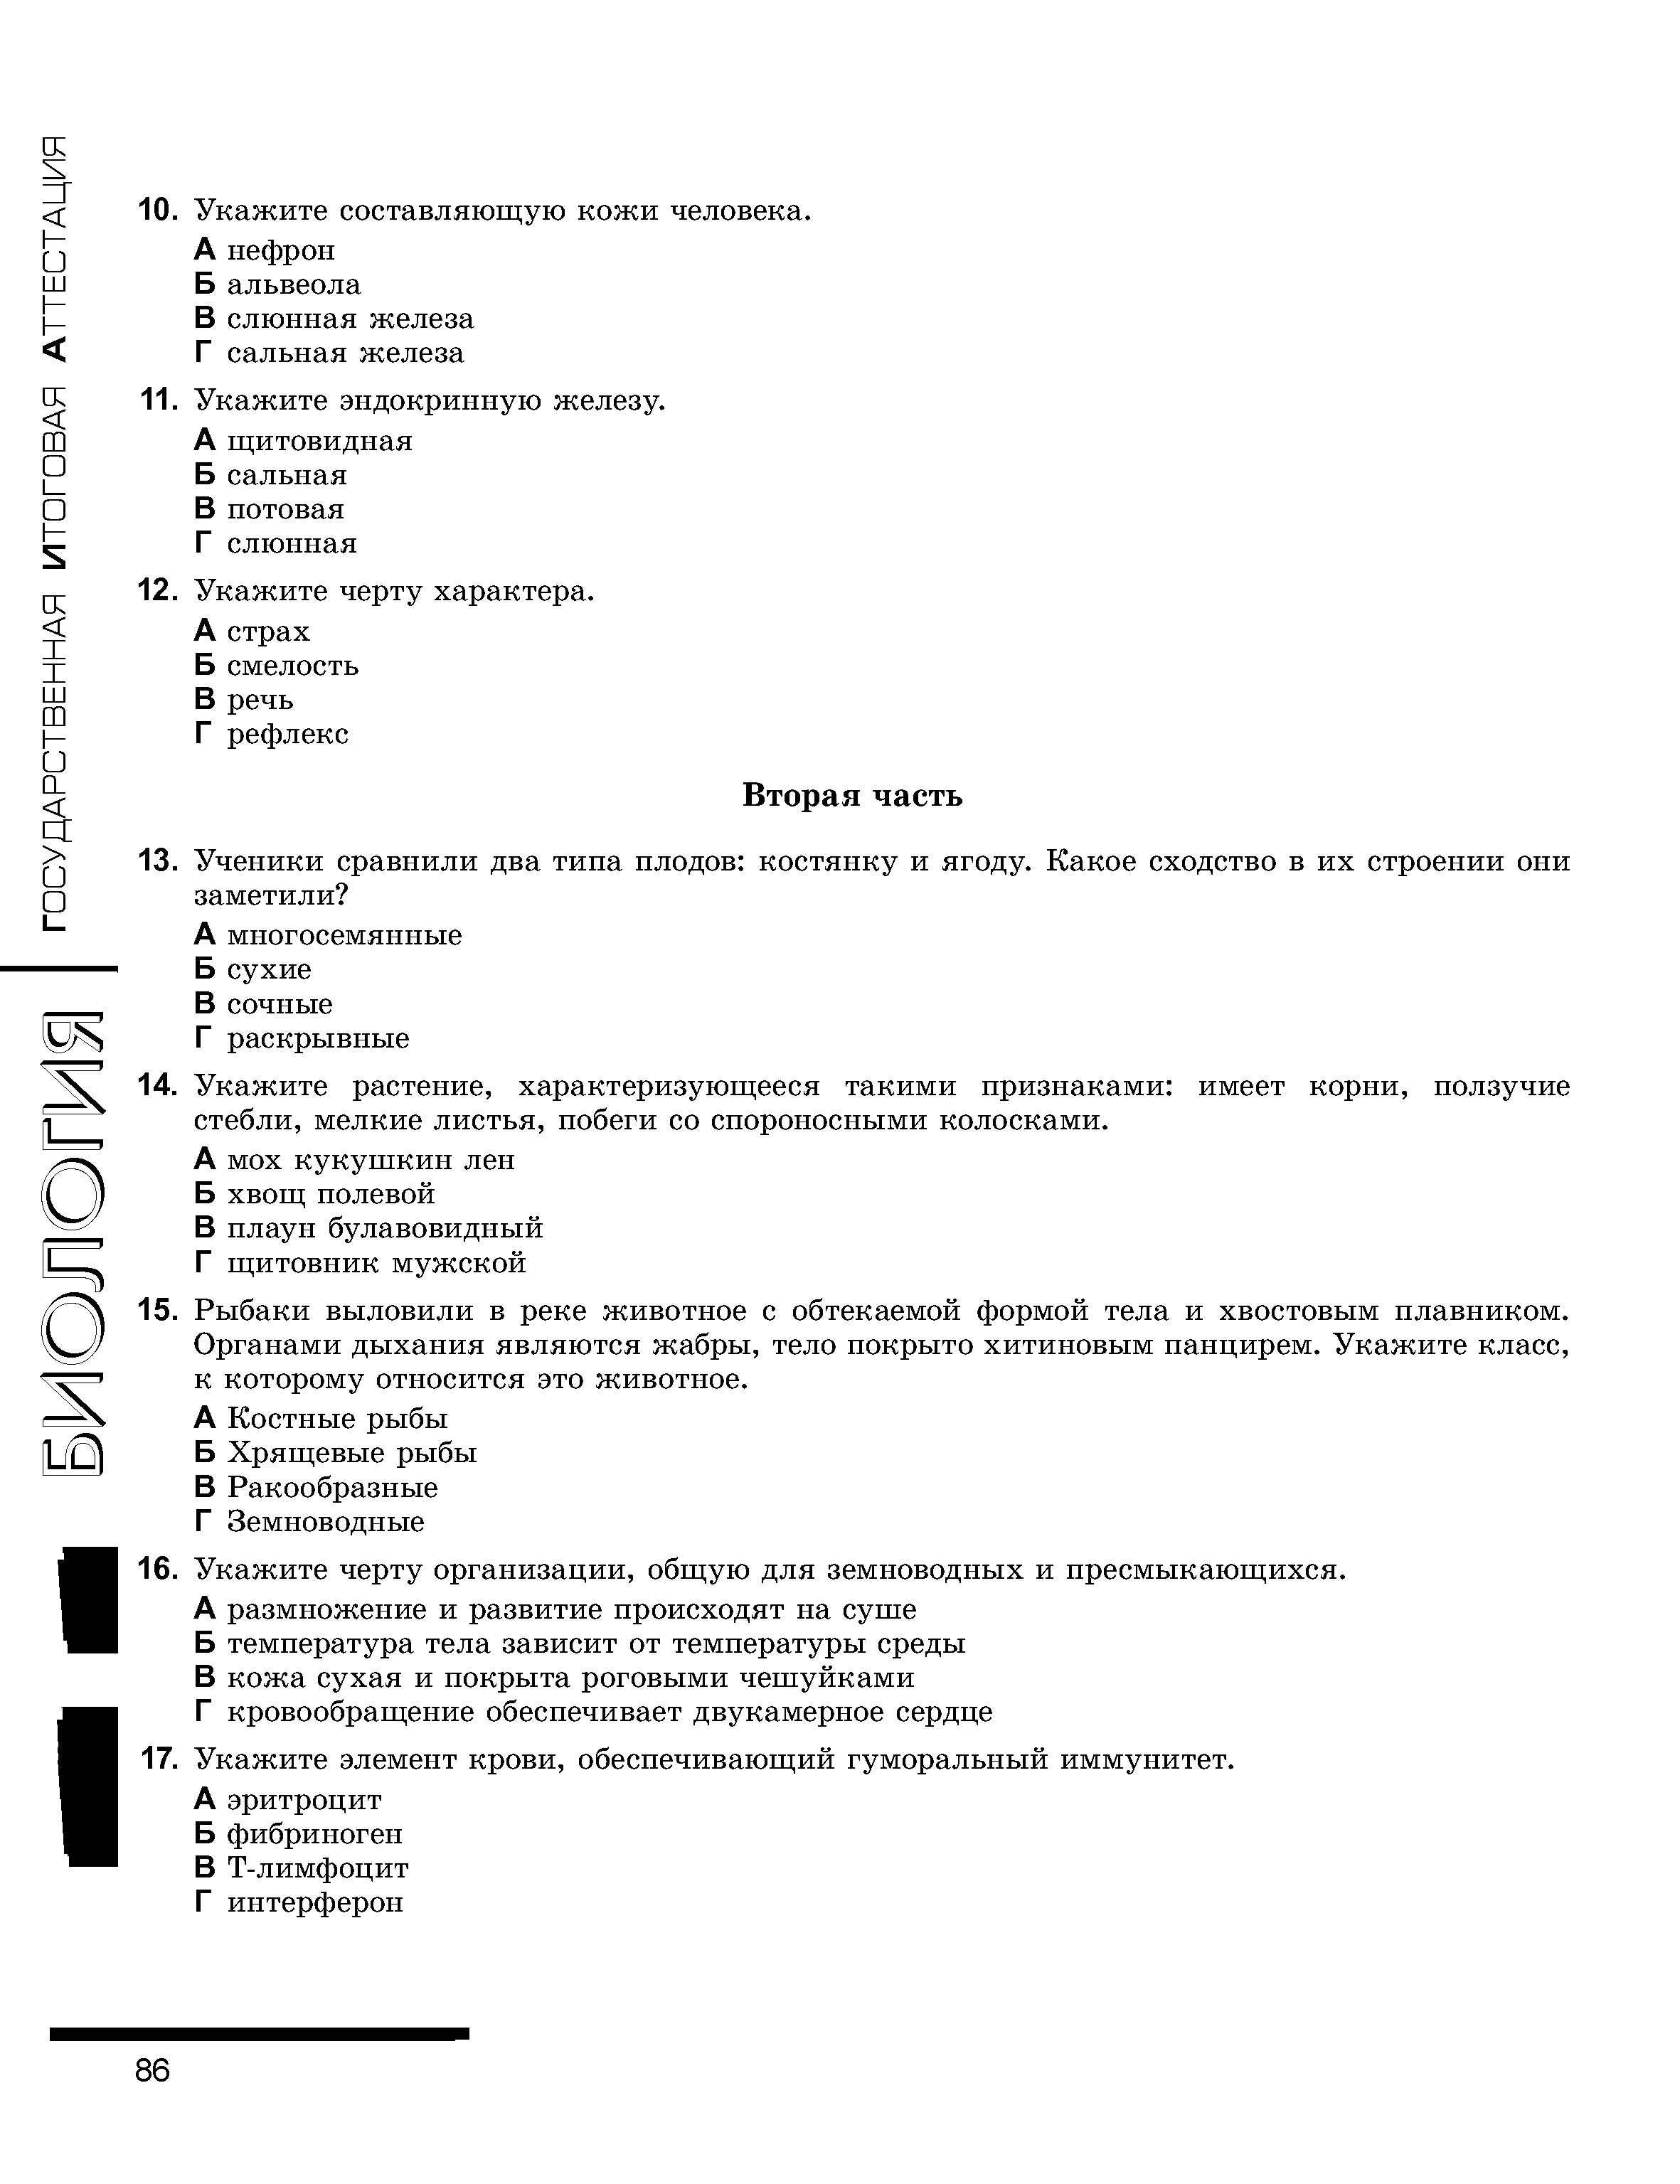 Решебник по рус 5 класс